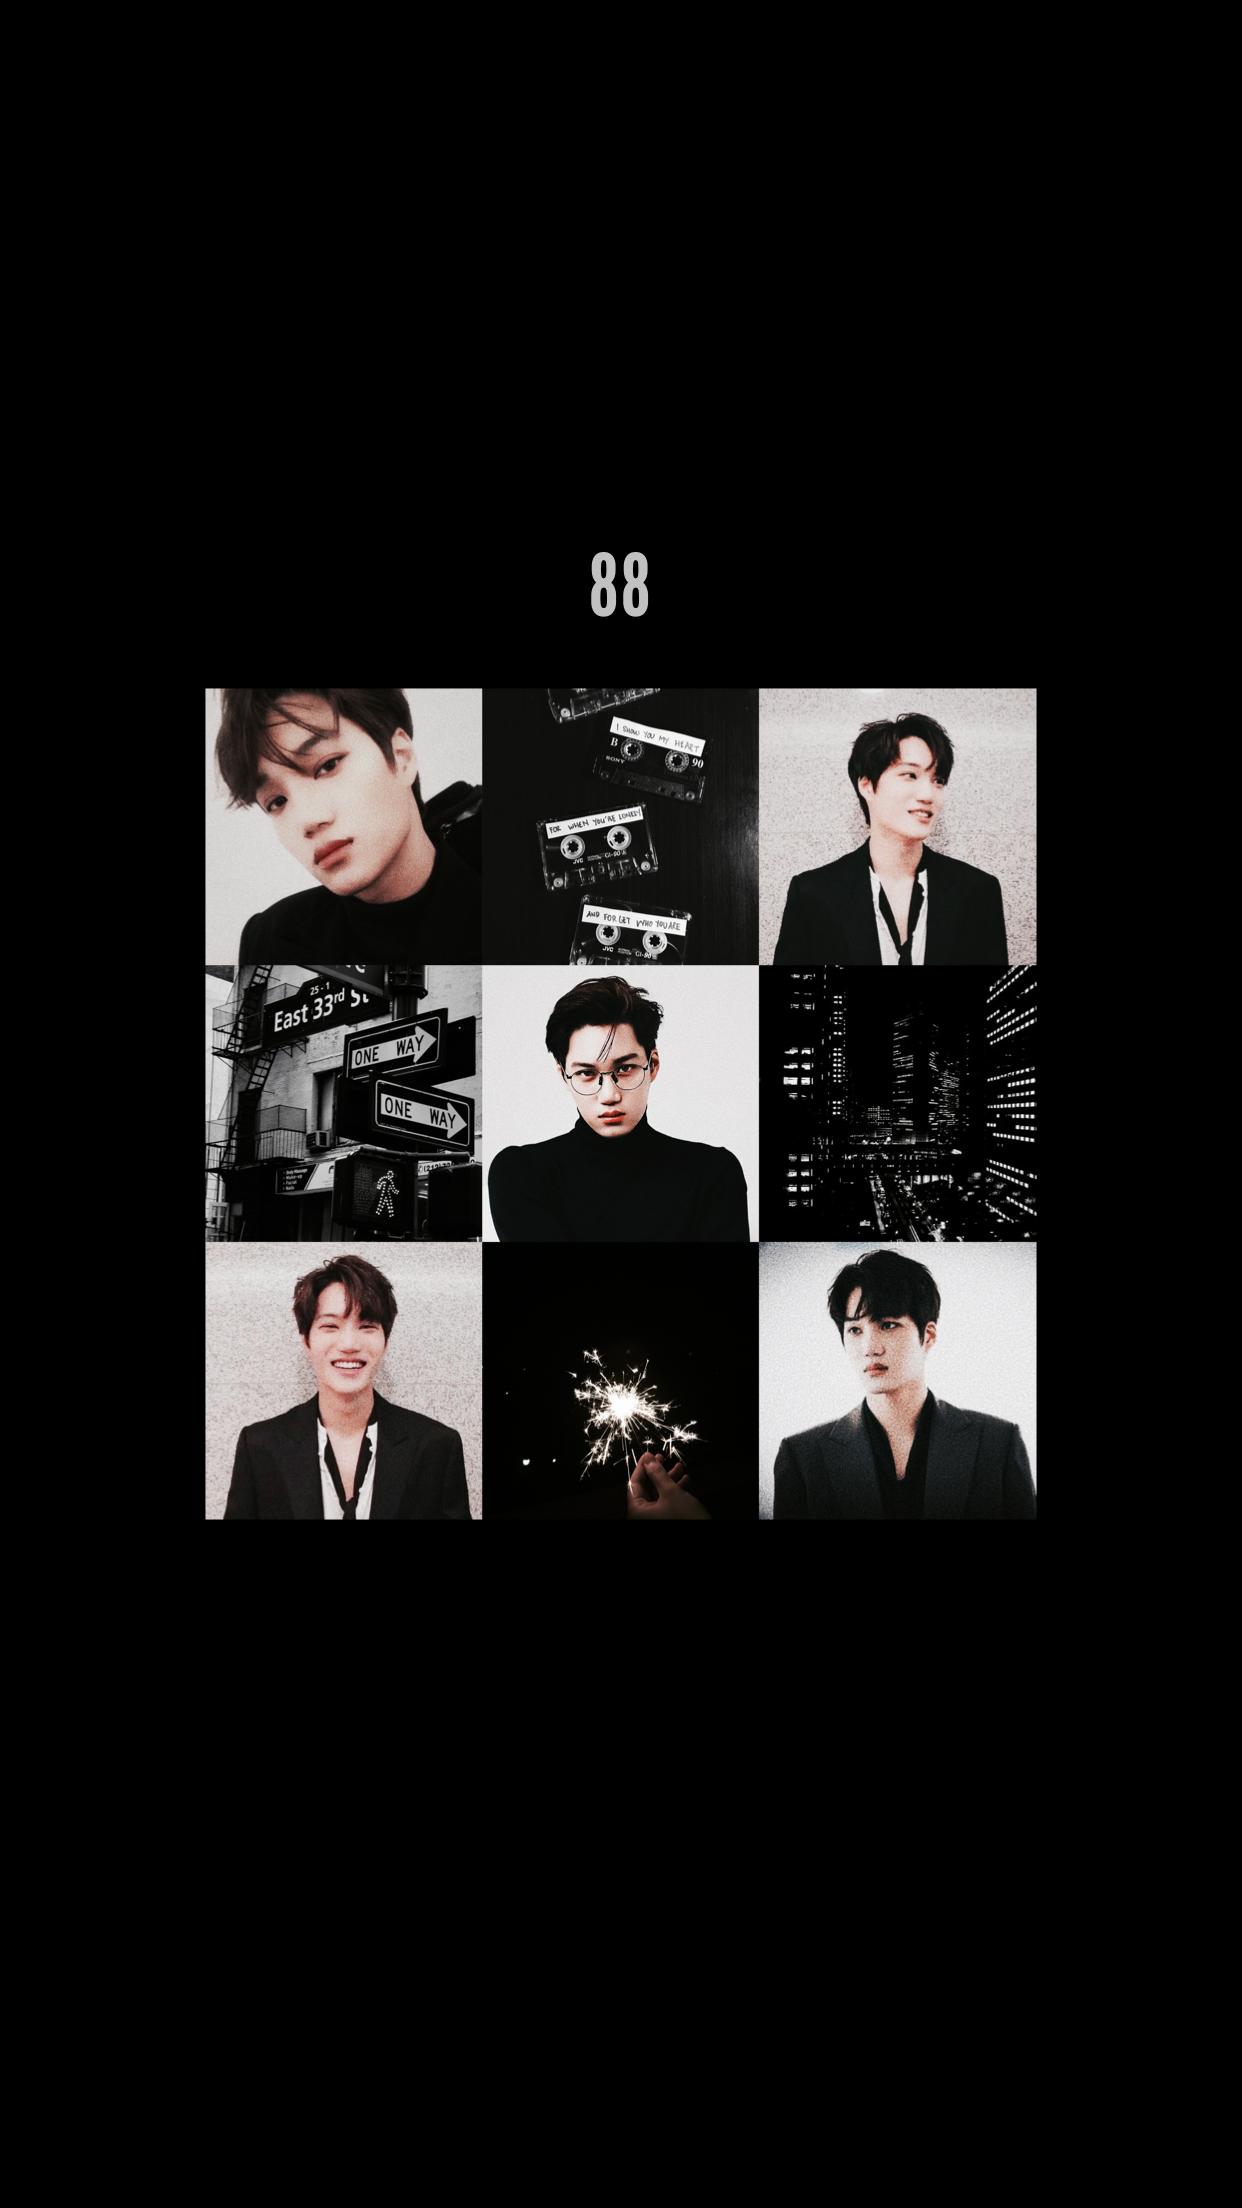 Exo Wallpaper Kai Jongin Exowallpaper Black Gambar Wallpaper Ponsel Exo